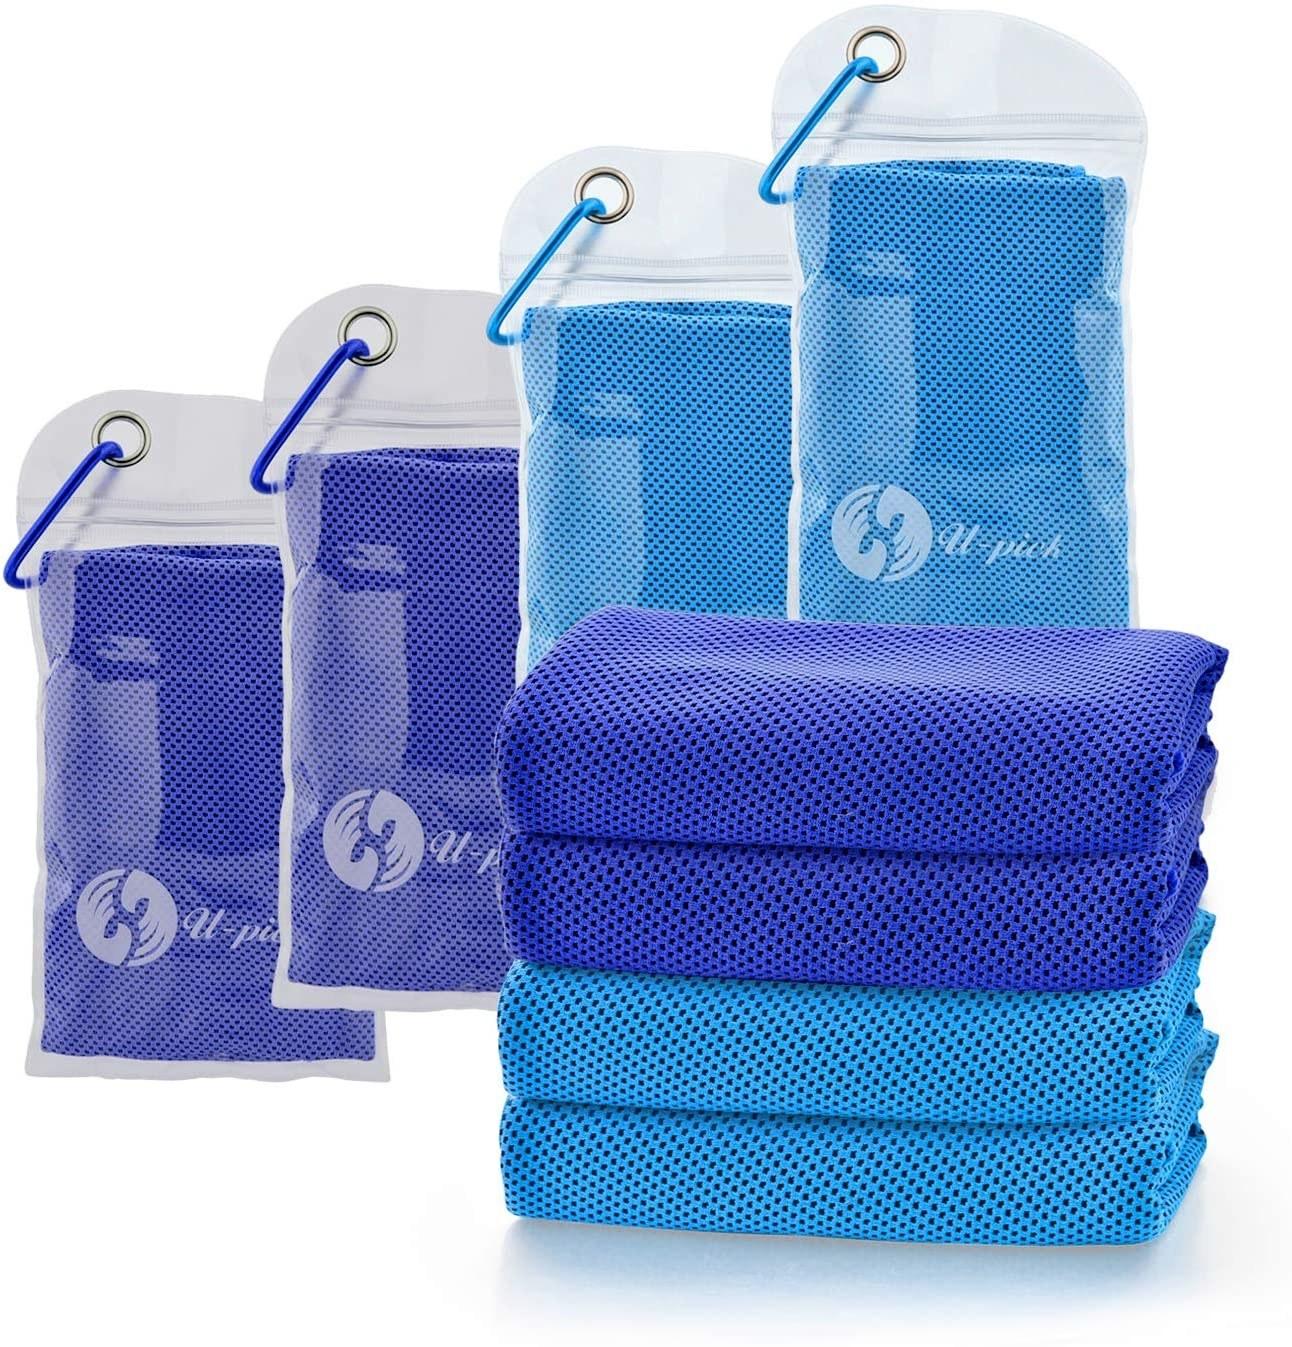 four packs of u-pick cooling towels and four folded u-pick cooling towels